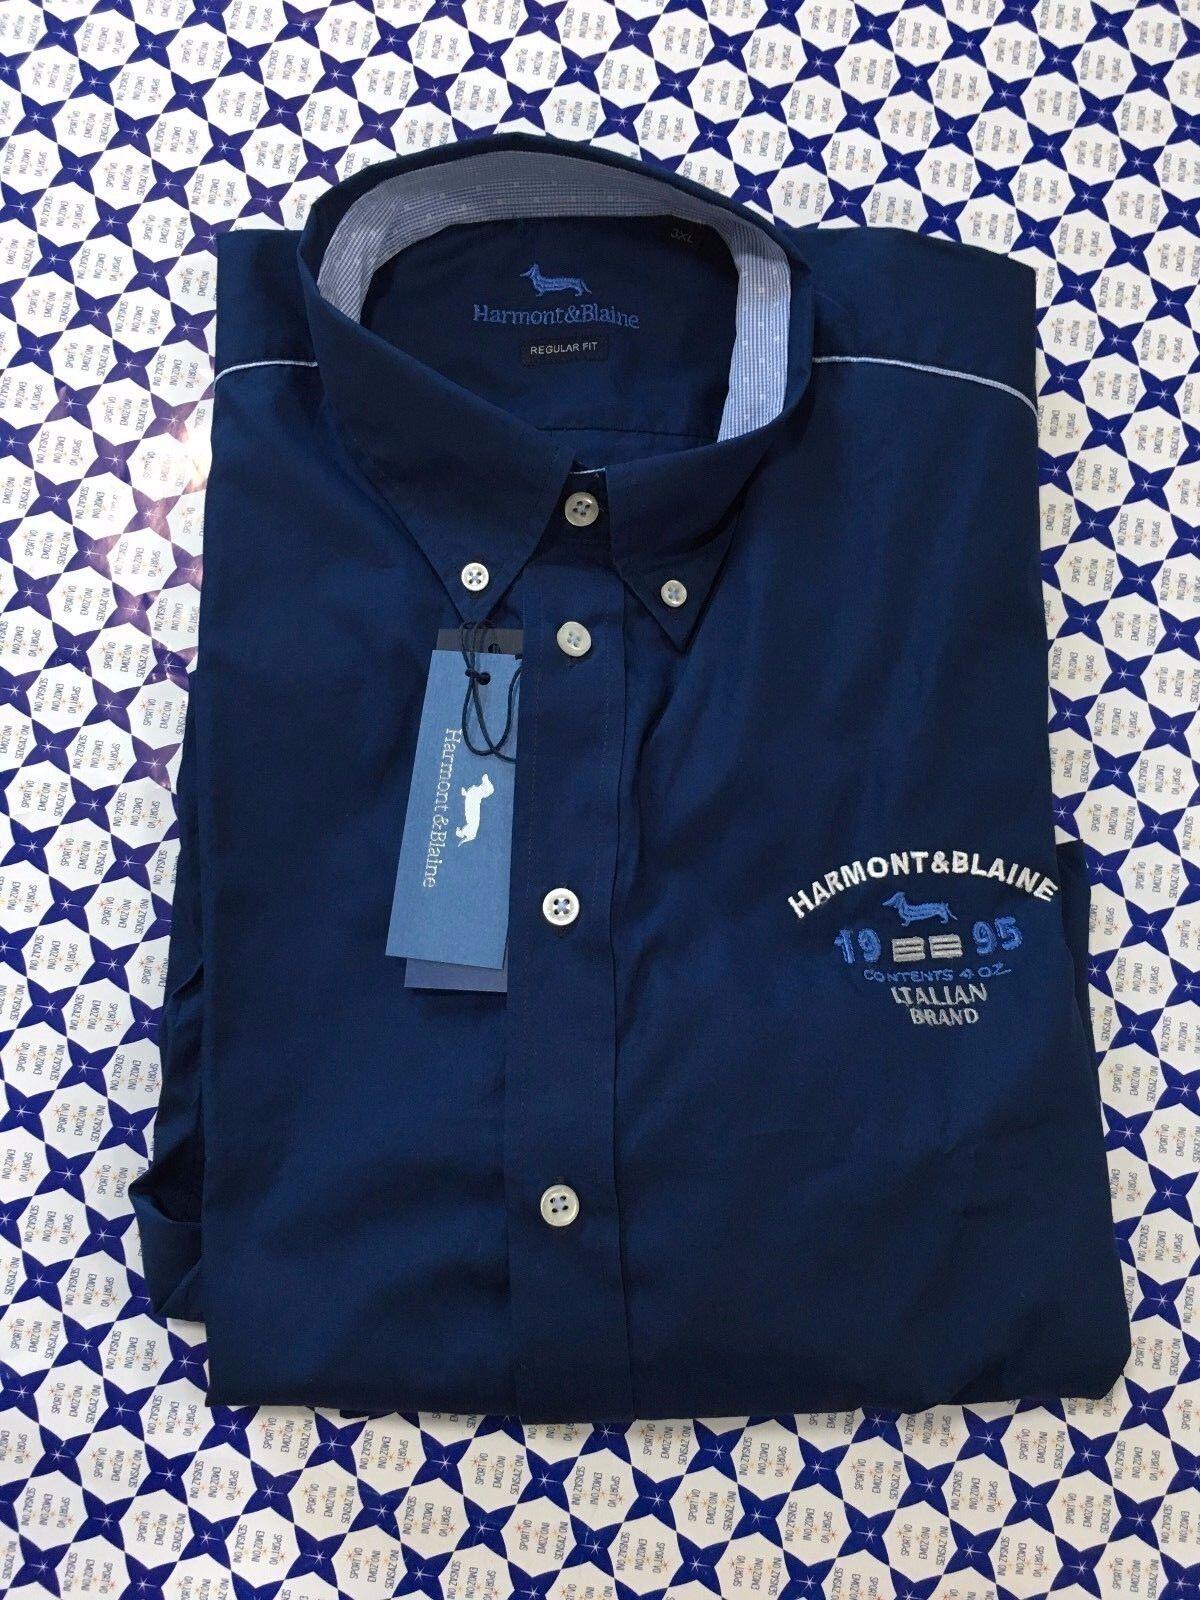 Camicia HARMONT & BLAINE Uomo Petto 1995 Toppe RF RF RF - Blu - C0A96 d01726